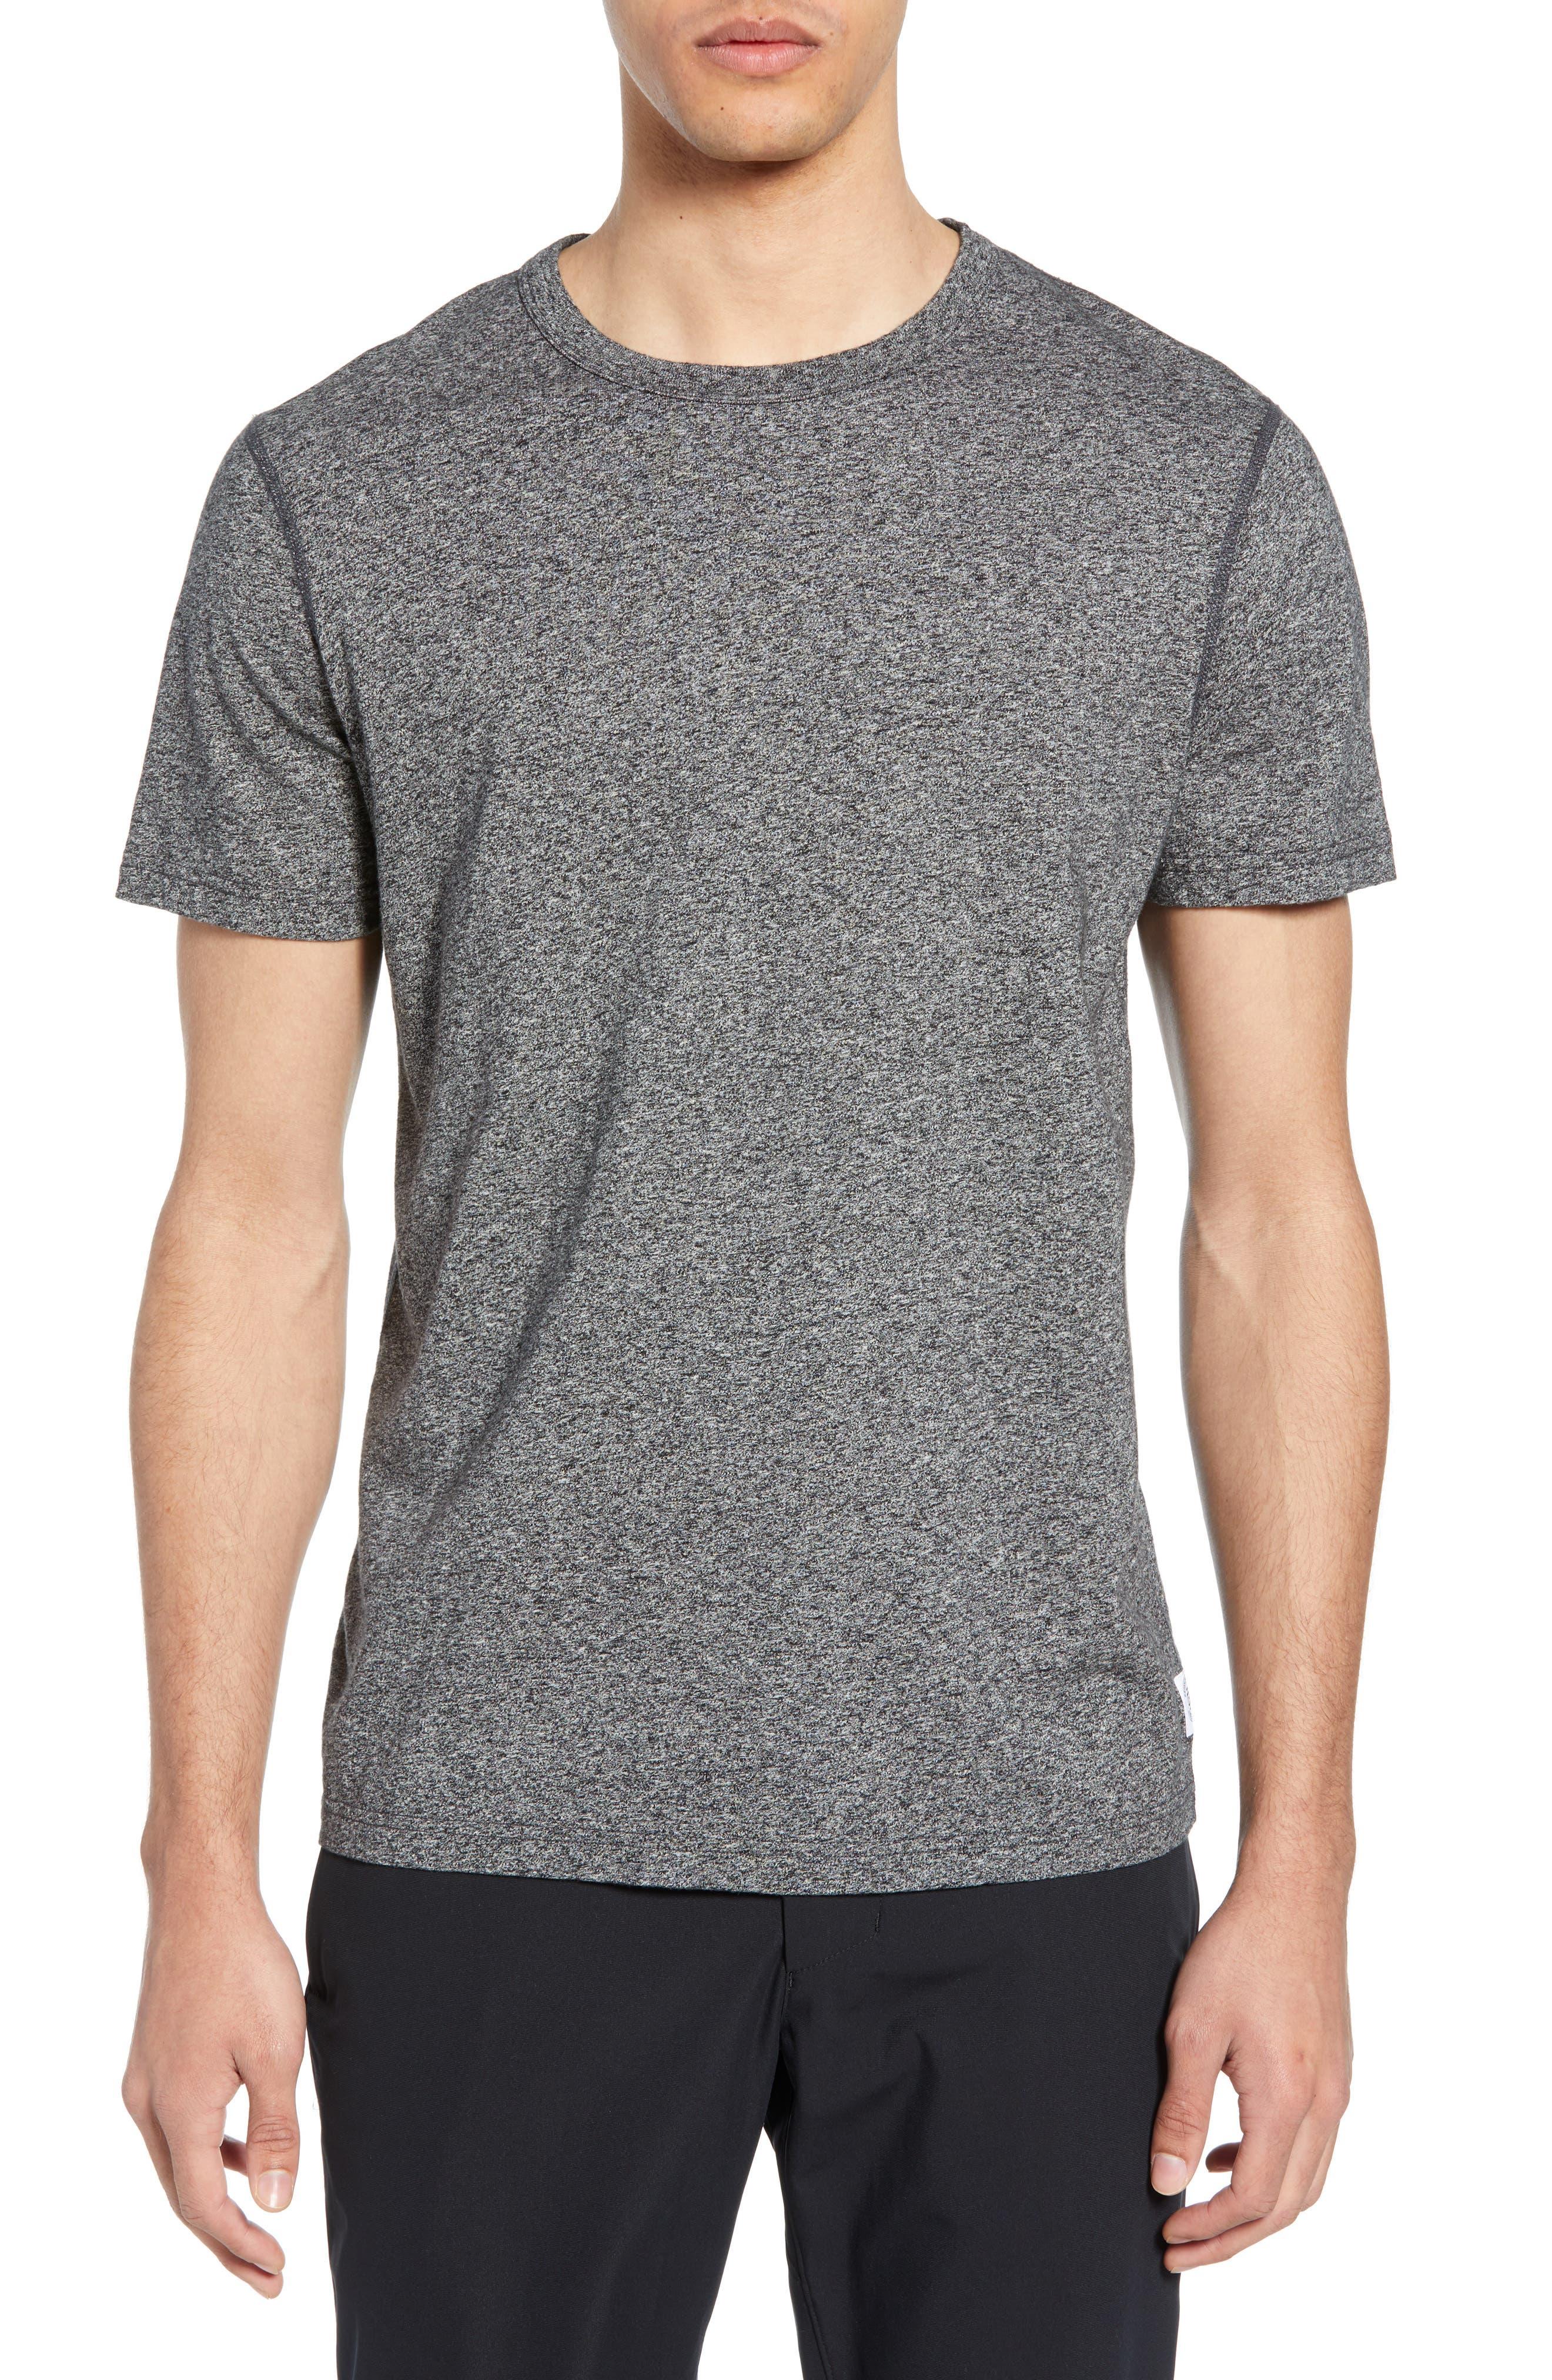 REIGNING CHAMP Short Sleeve Crewneck T-Shirt, Main, color, MEDIUM BLACK